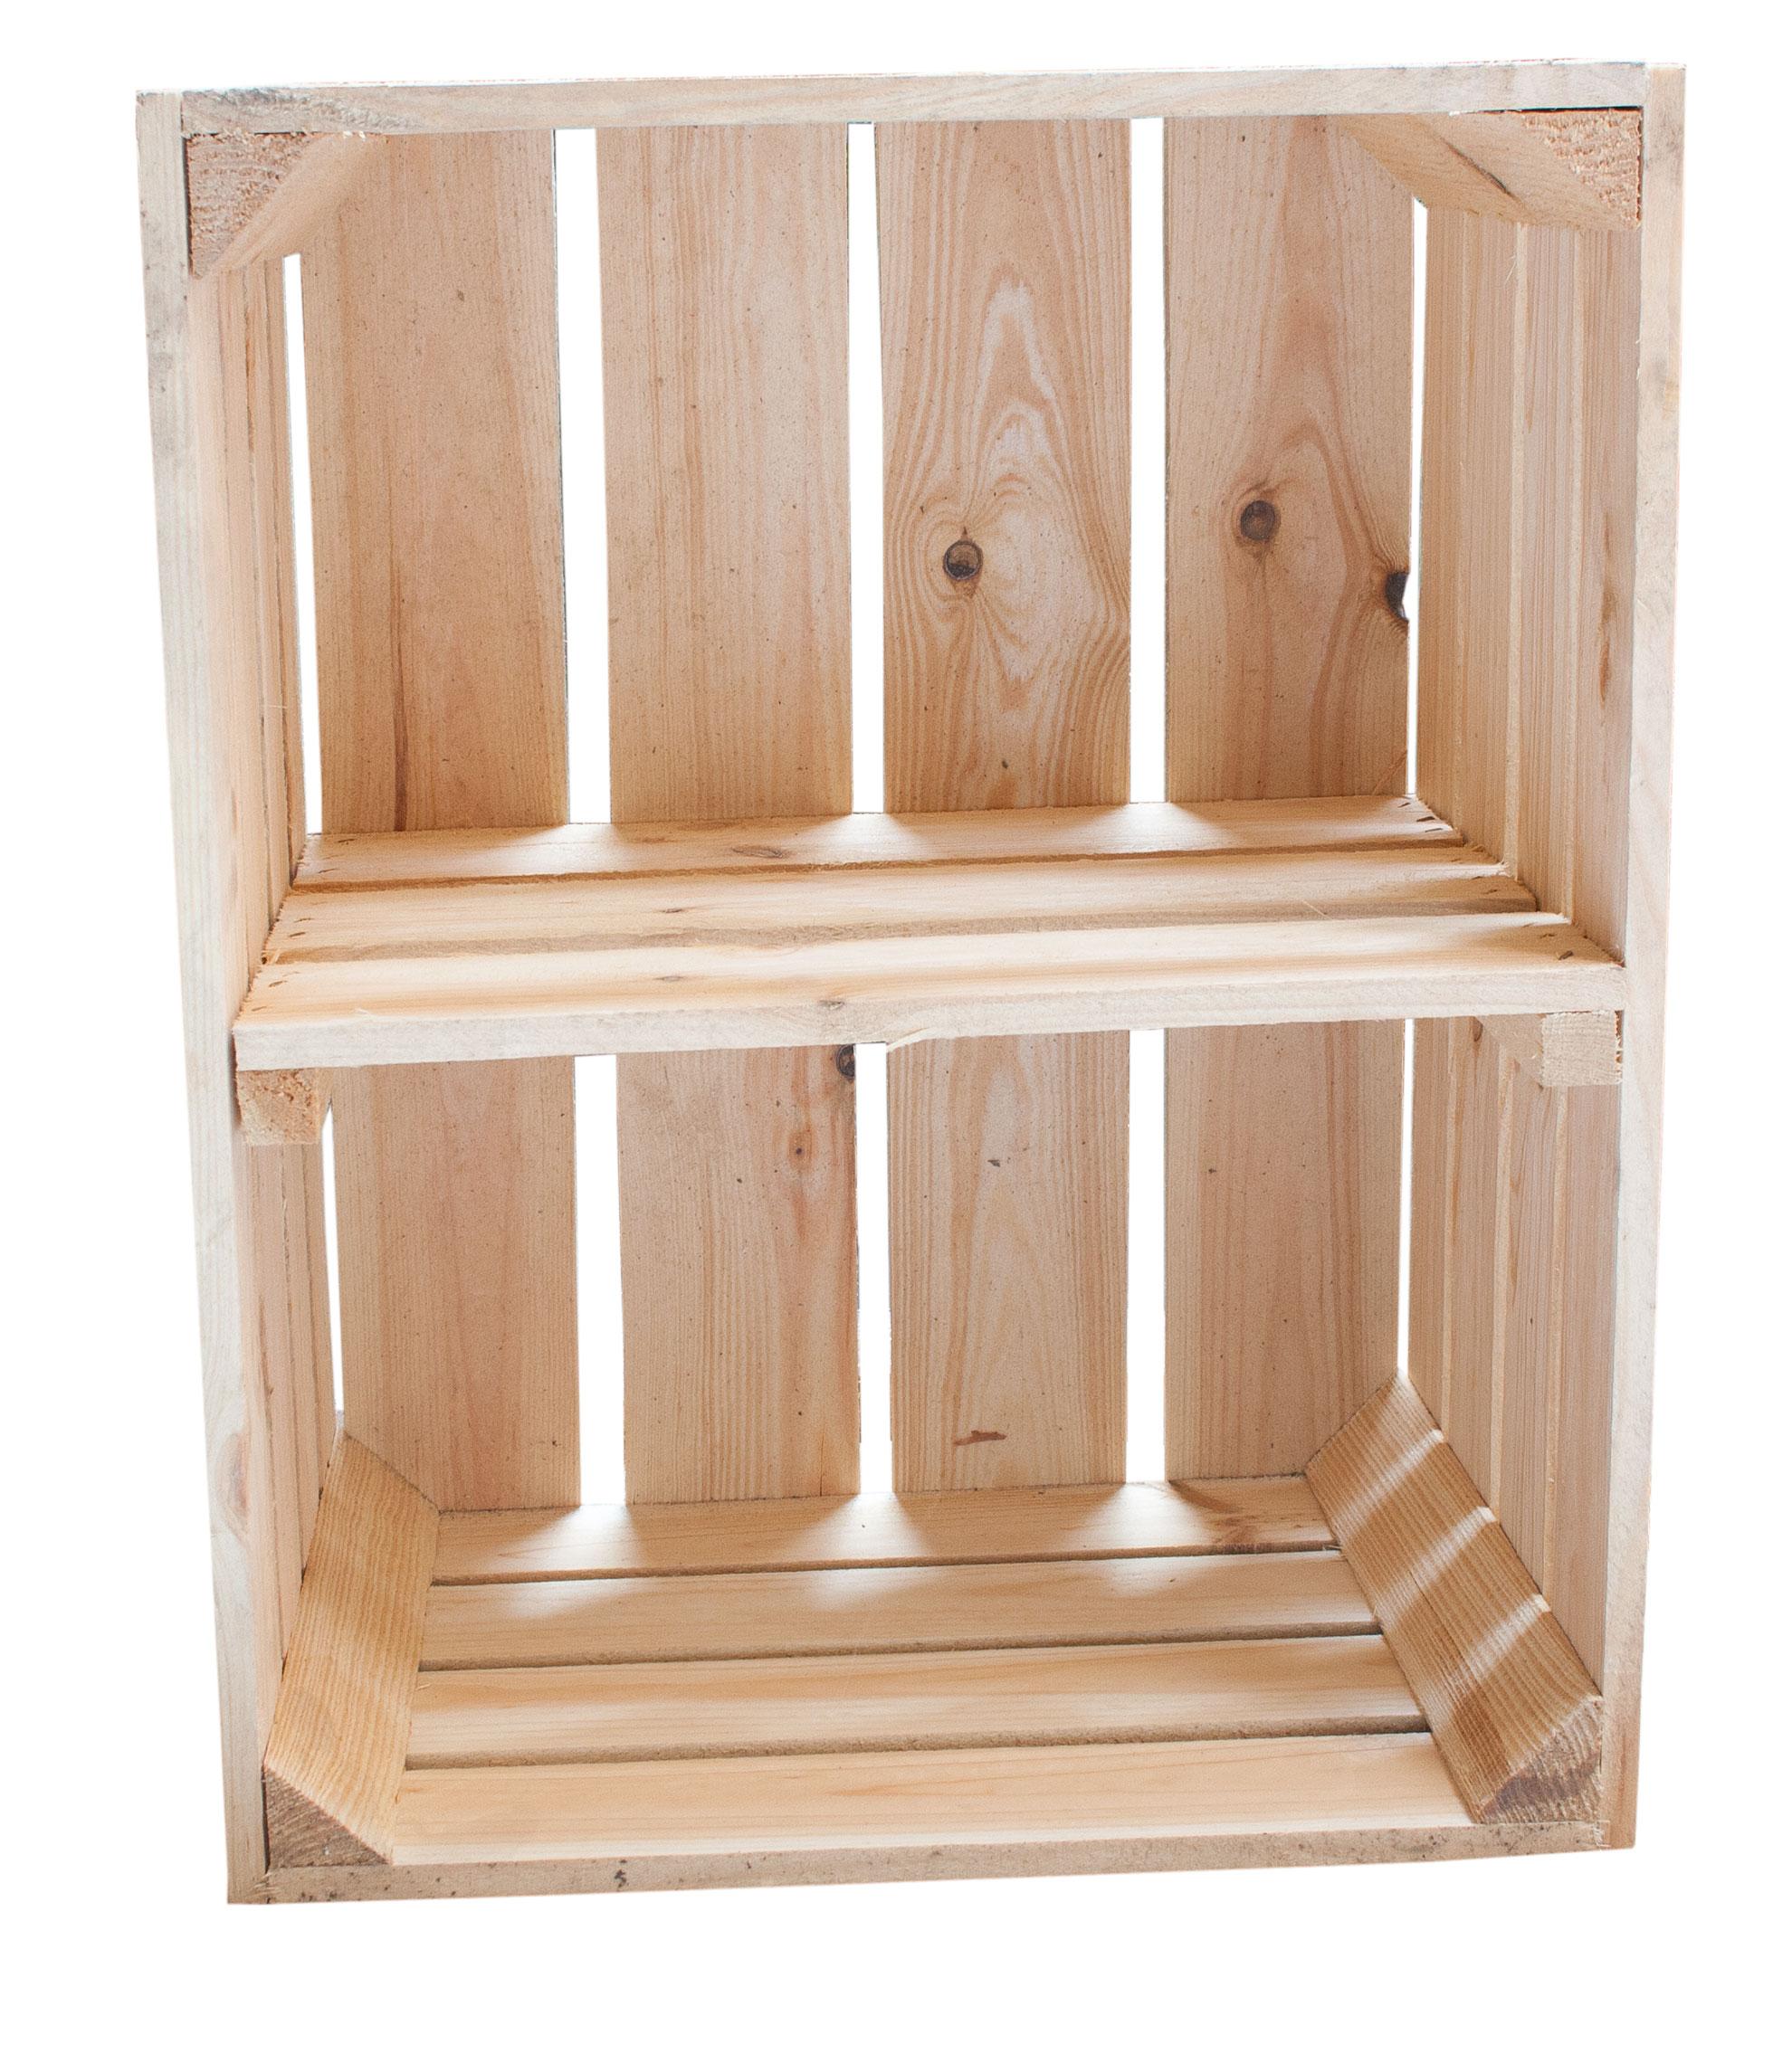 sale 6er set helle kiste f r schuh oder b cherregal kurzes mittelbrett 50x40x30cm. Black Bedroom Furniture Sets. Home Design Ideas